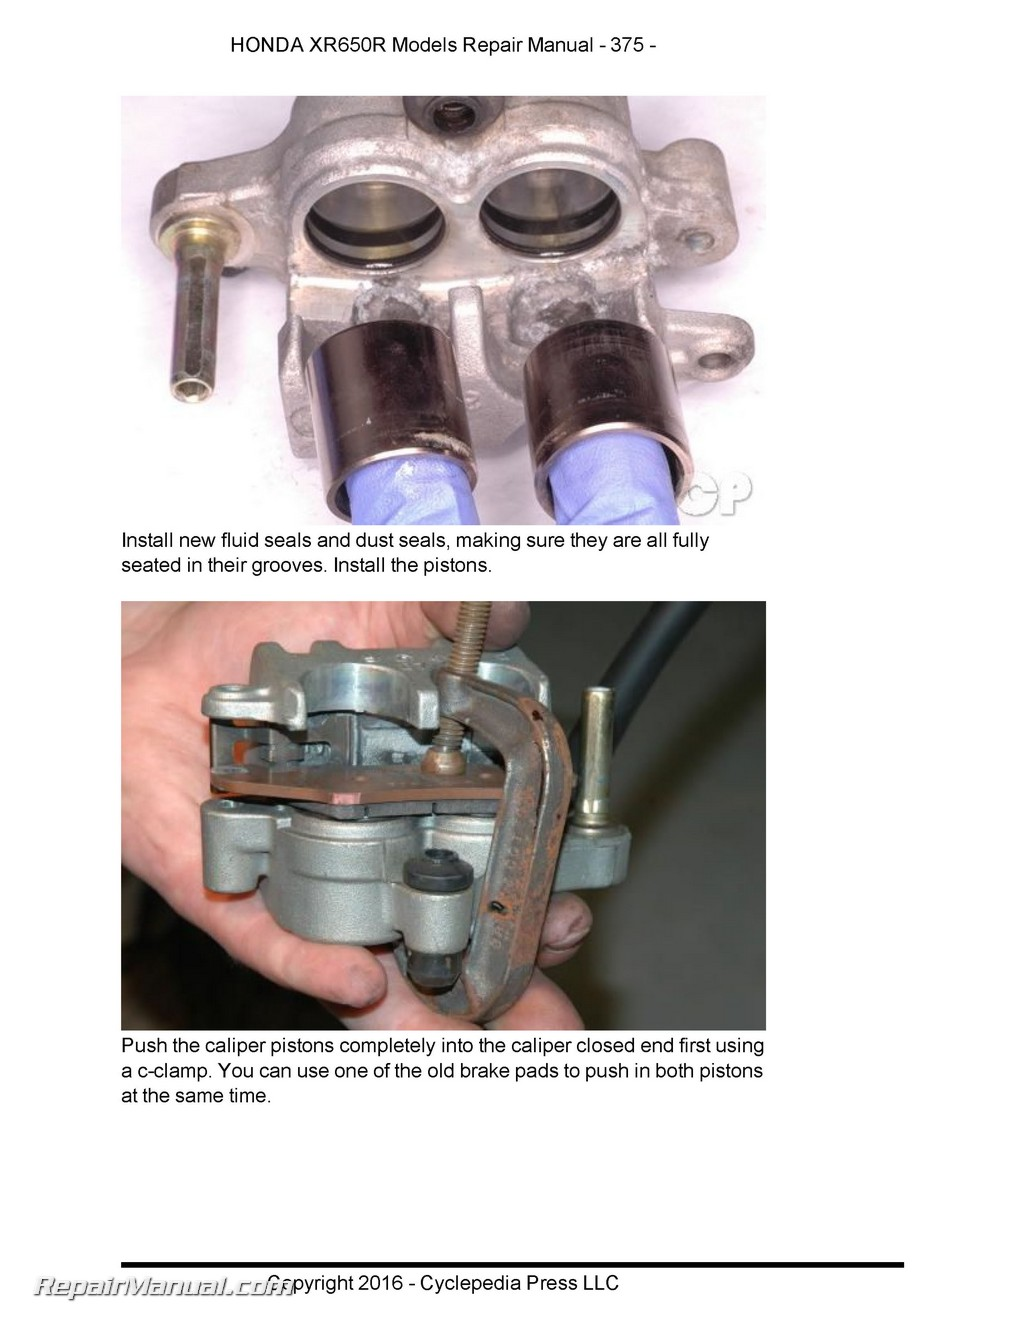 2000 Honda Xr650l Wiring Diagram Diagrams Zb50 Xr650r Trusted